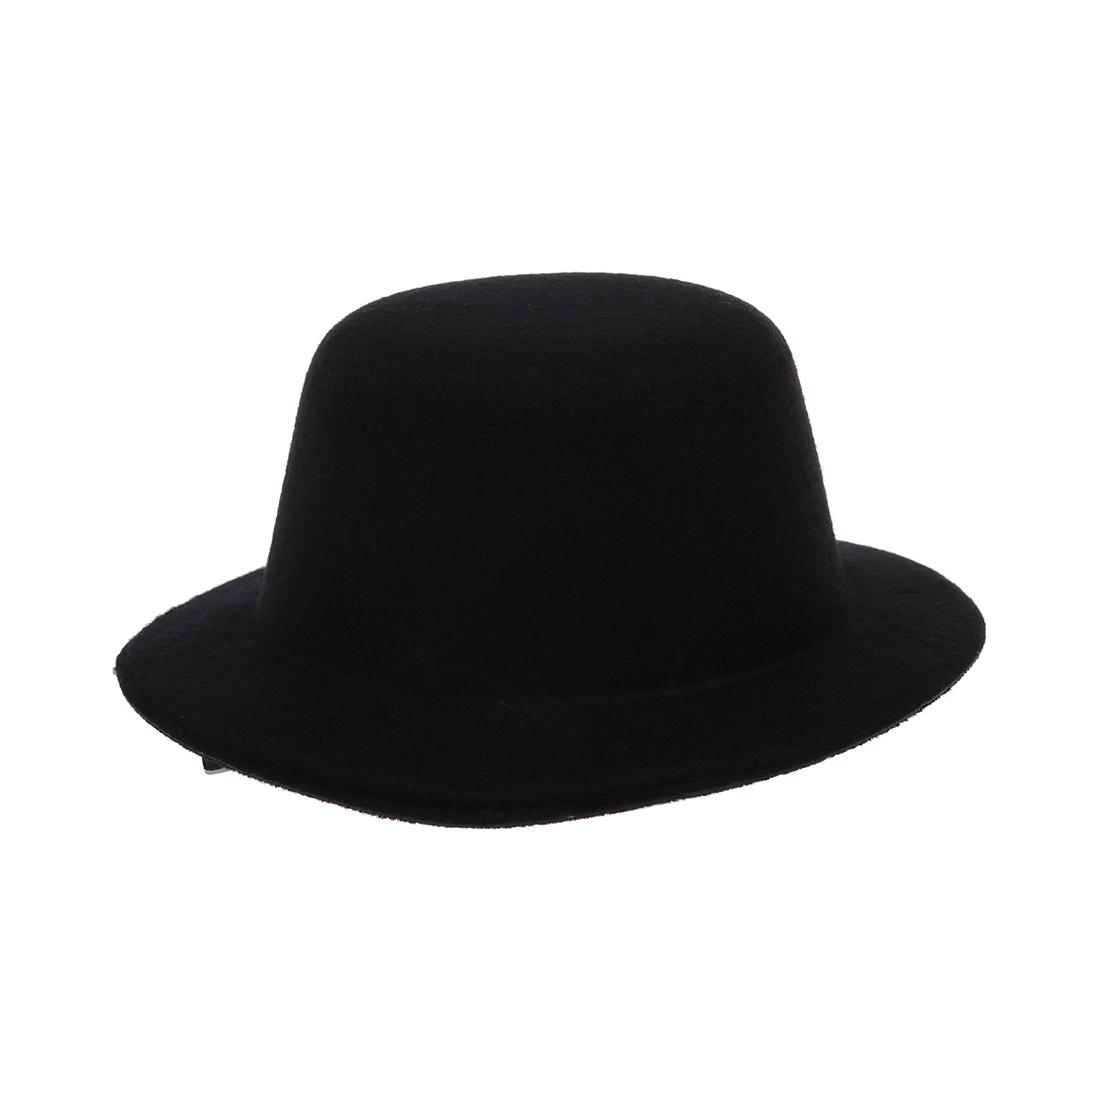 Kopfschmuck & Fascinators Aufrichtig Damen Mini Hut Fascinator Burlesque Mode H1z7 L9j9 M4p5